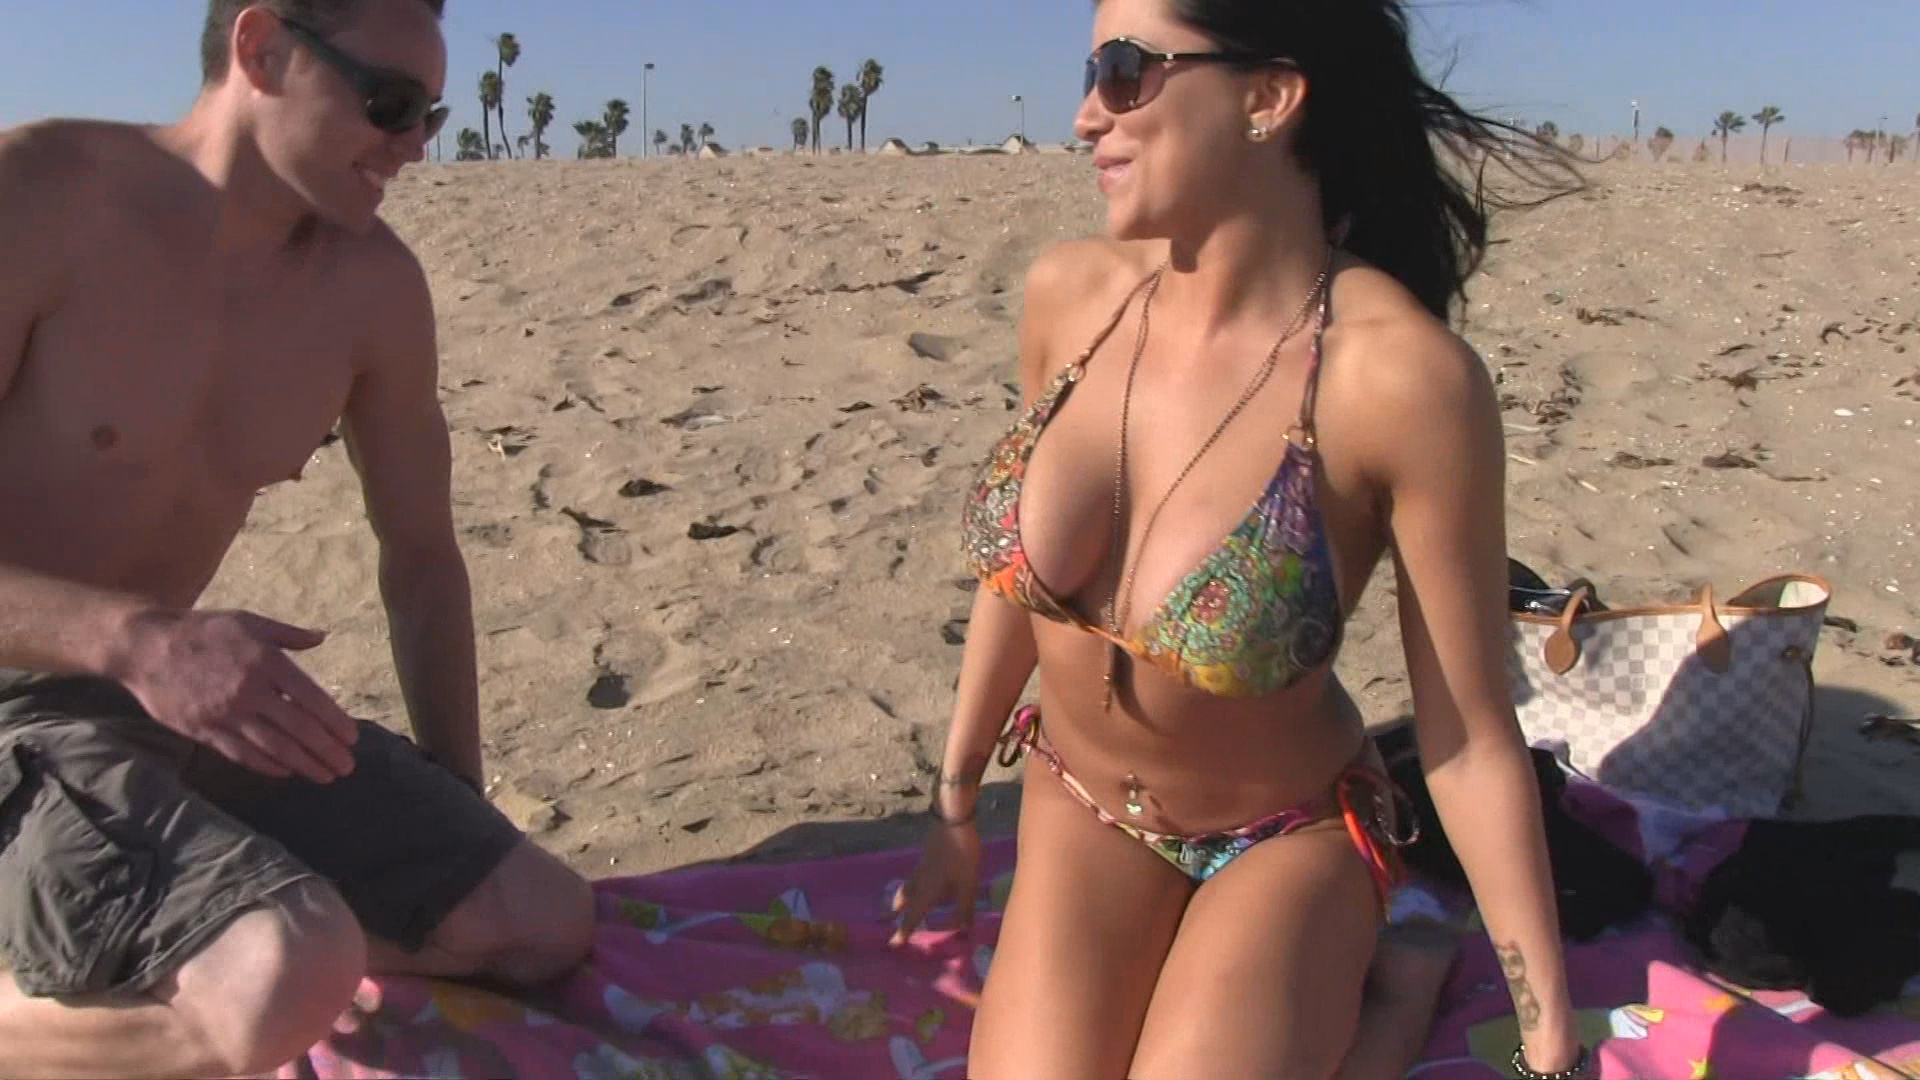 Big Tits On The Beach 2